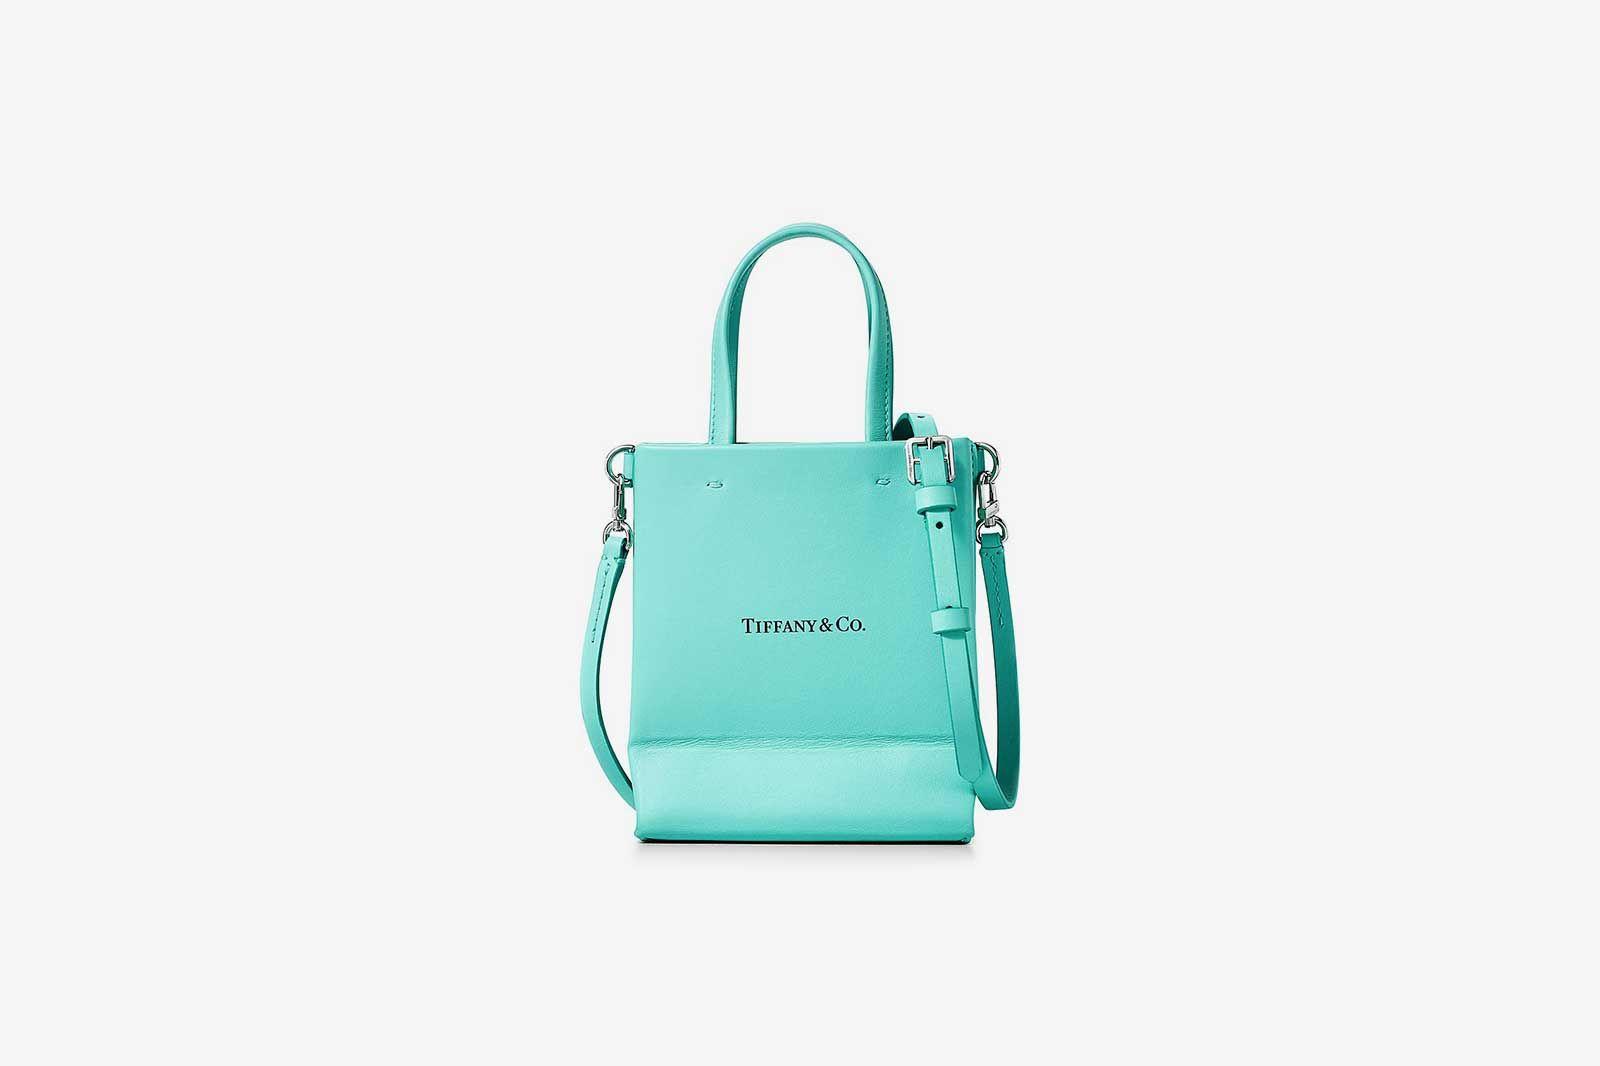 tiffany-co-leather-handbag-2